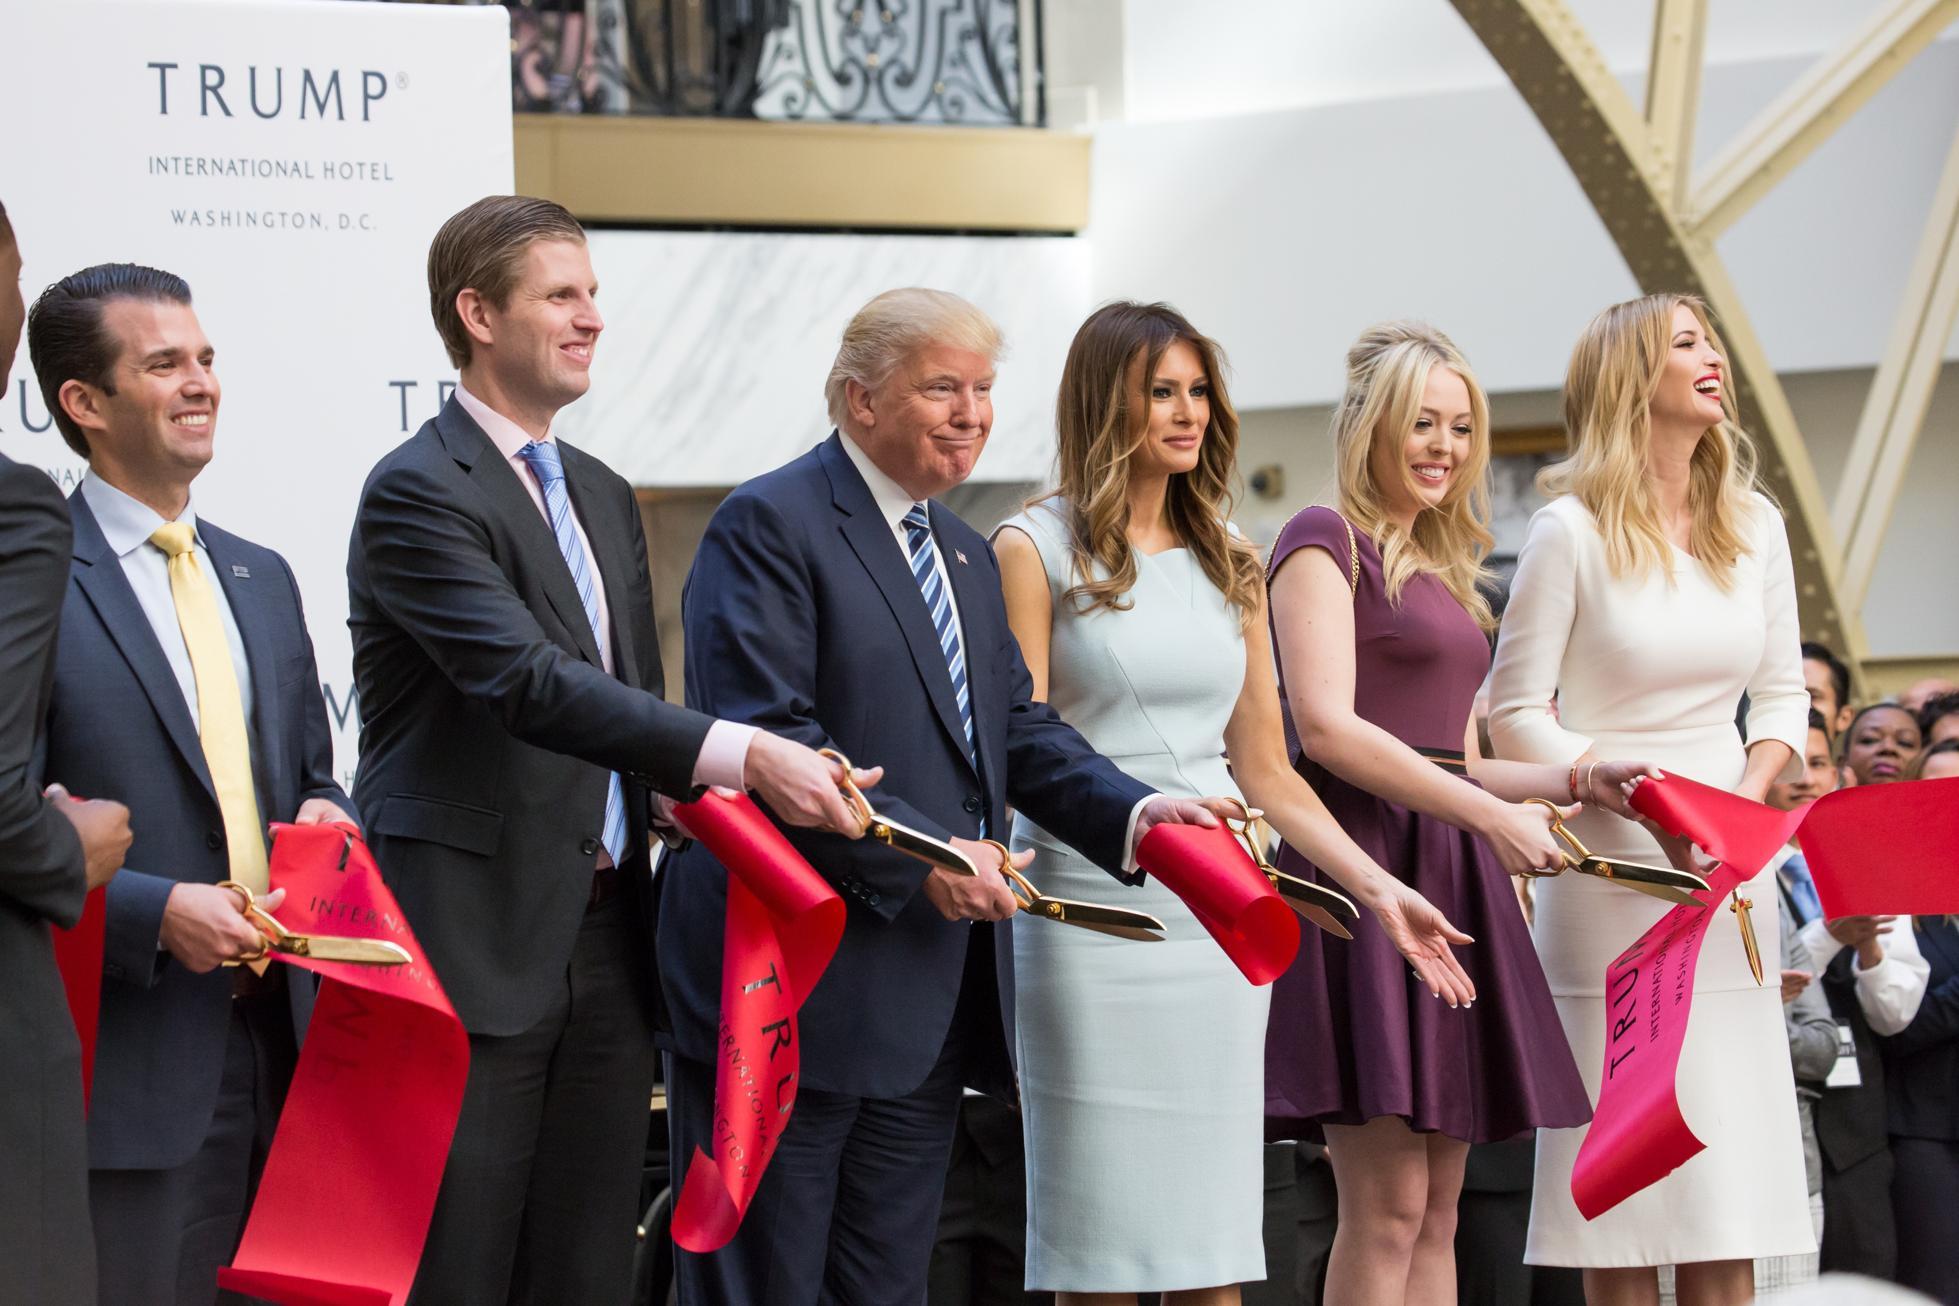 Trump Hotel Washington, D.C. lease